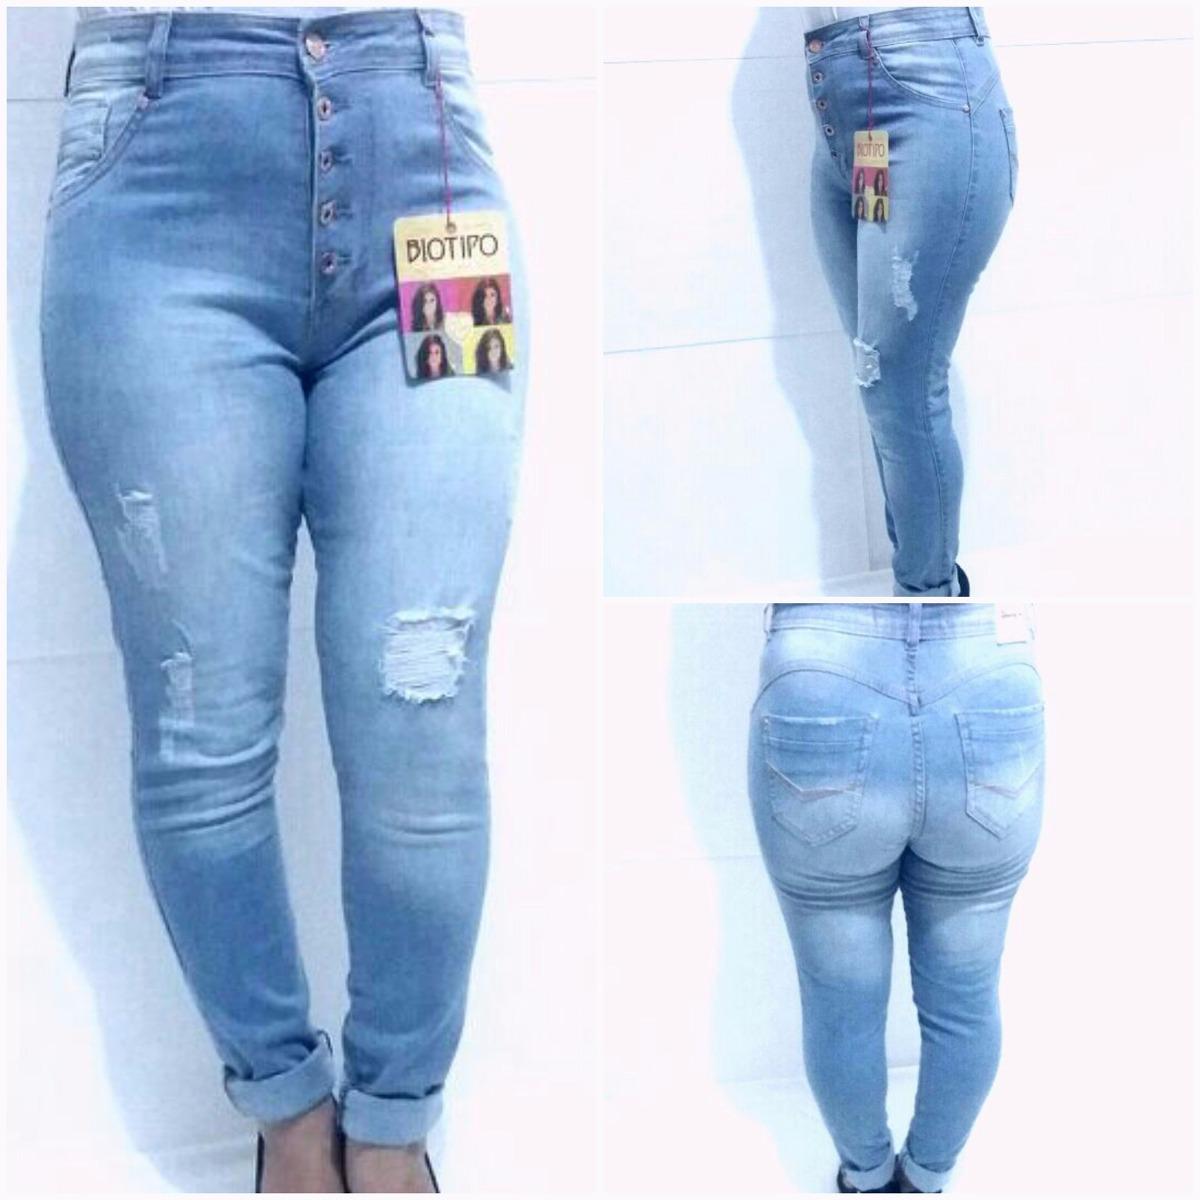 fafa67338 calça jeans skinny cintura alta feminina biotipo da moda. Carregando zoom.